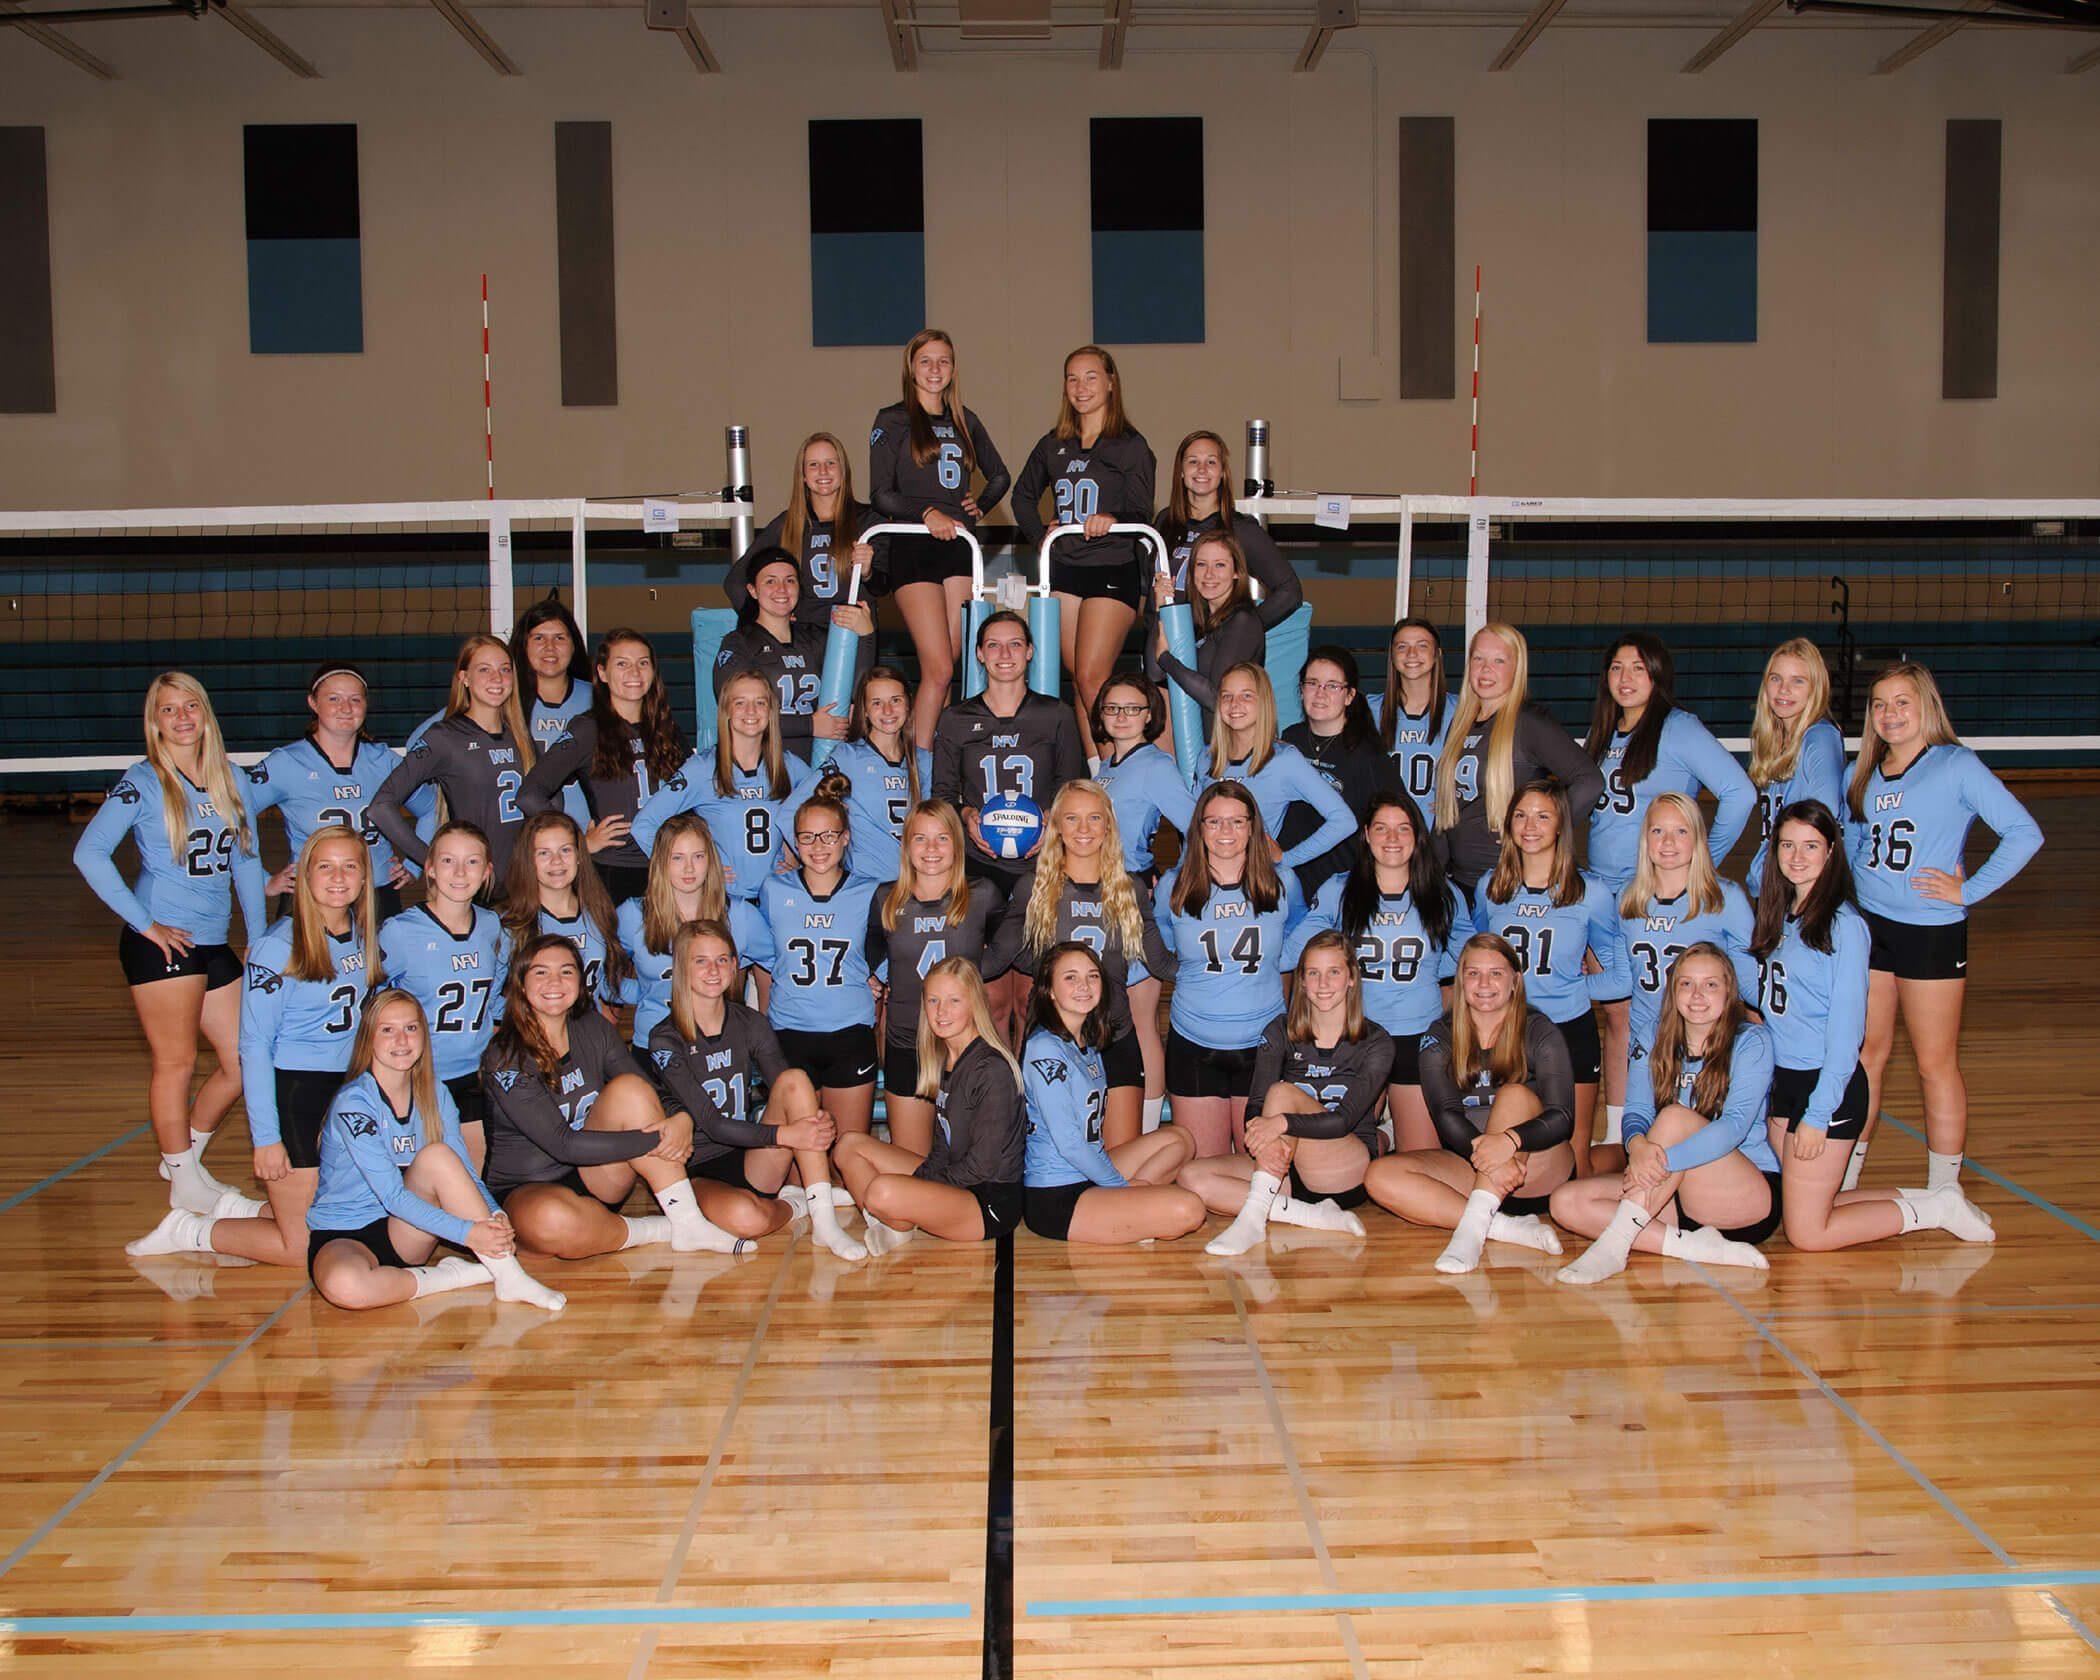 NFV High School 2017 Volleyball Team Photograph